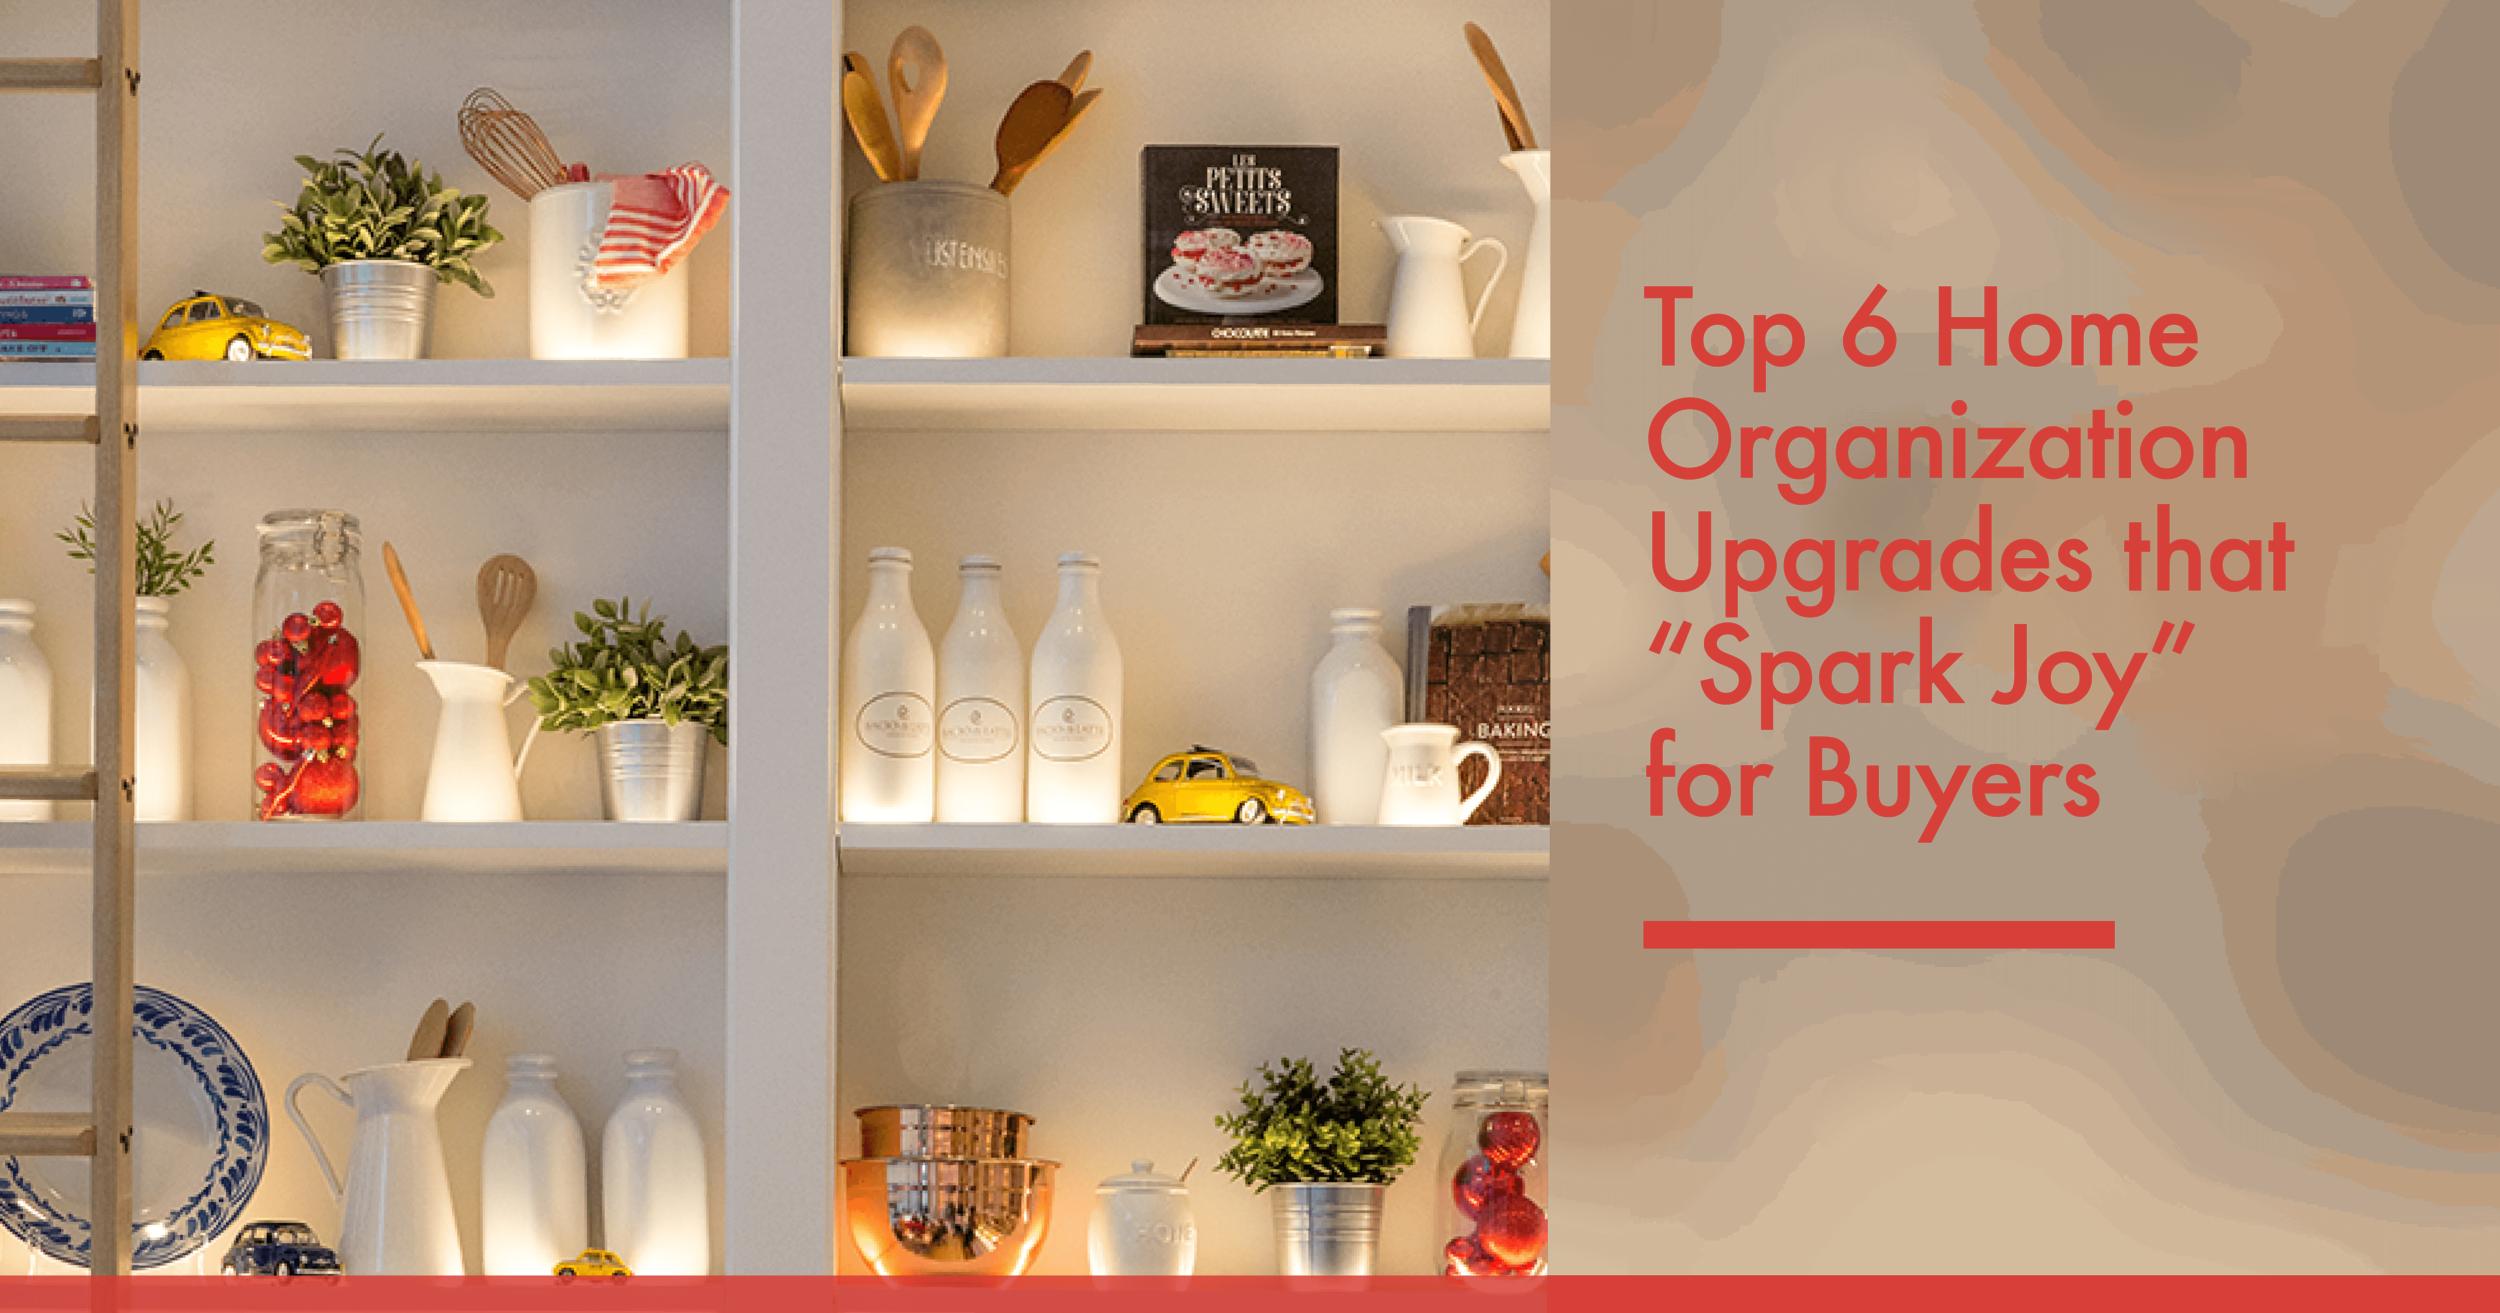 "Top 6 Home Organization Upgrades that ""Spark Joy"" for Buyers.pngTop 6 Home Organization Upgrades that ""Spark Joy"" for Buyers"